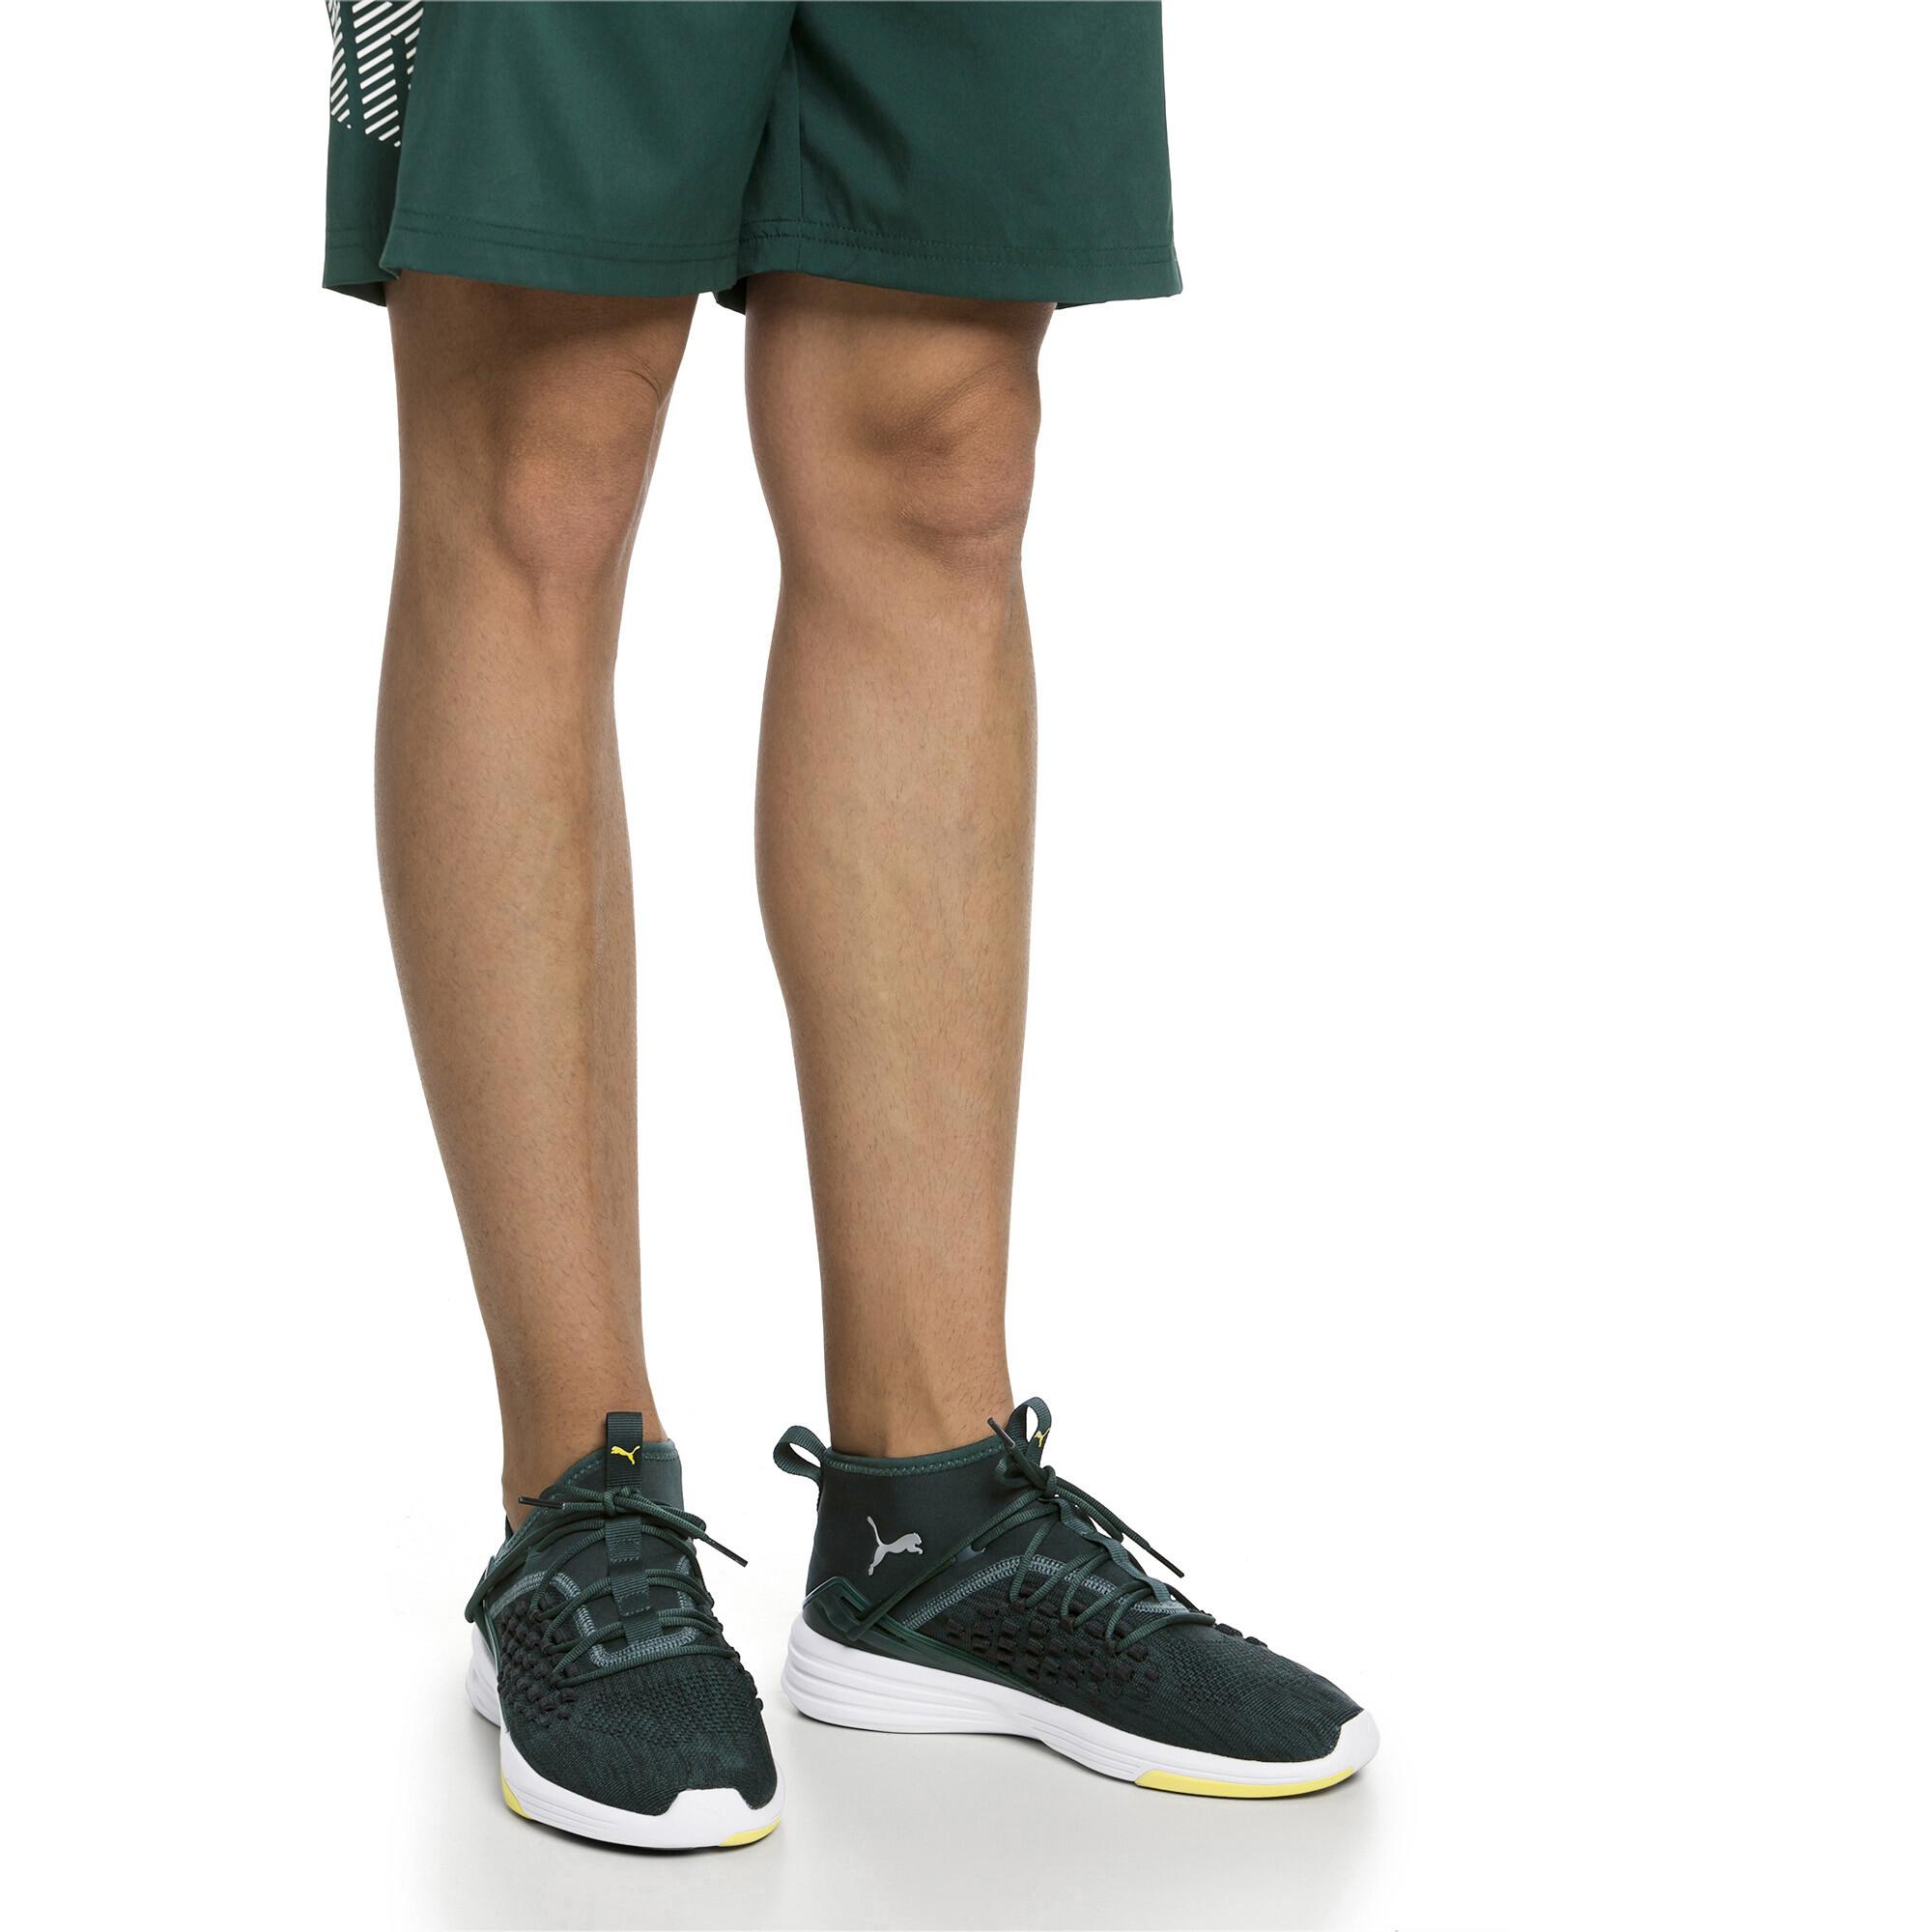 Image Puma Mantra Men's Sneakers #2